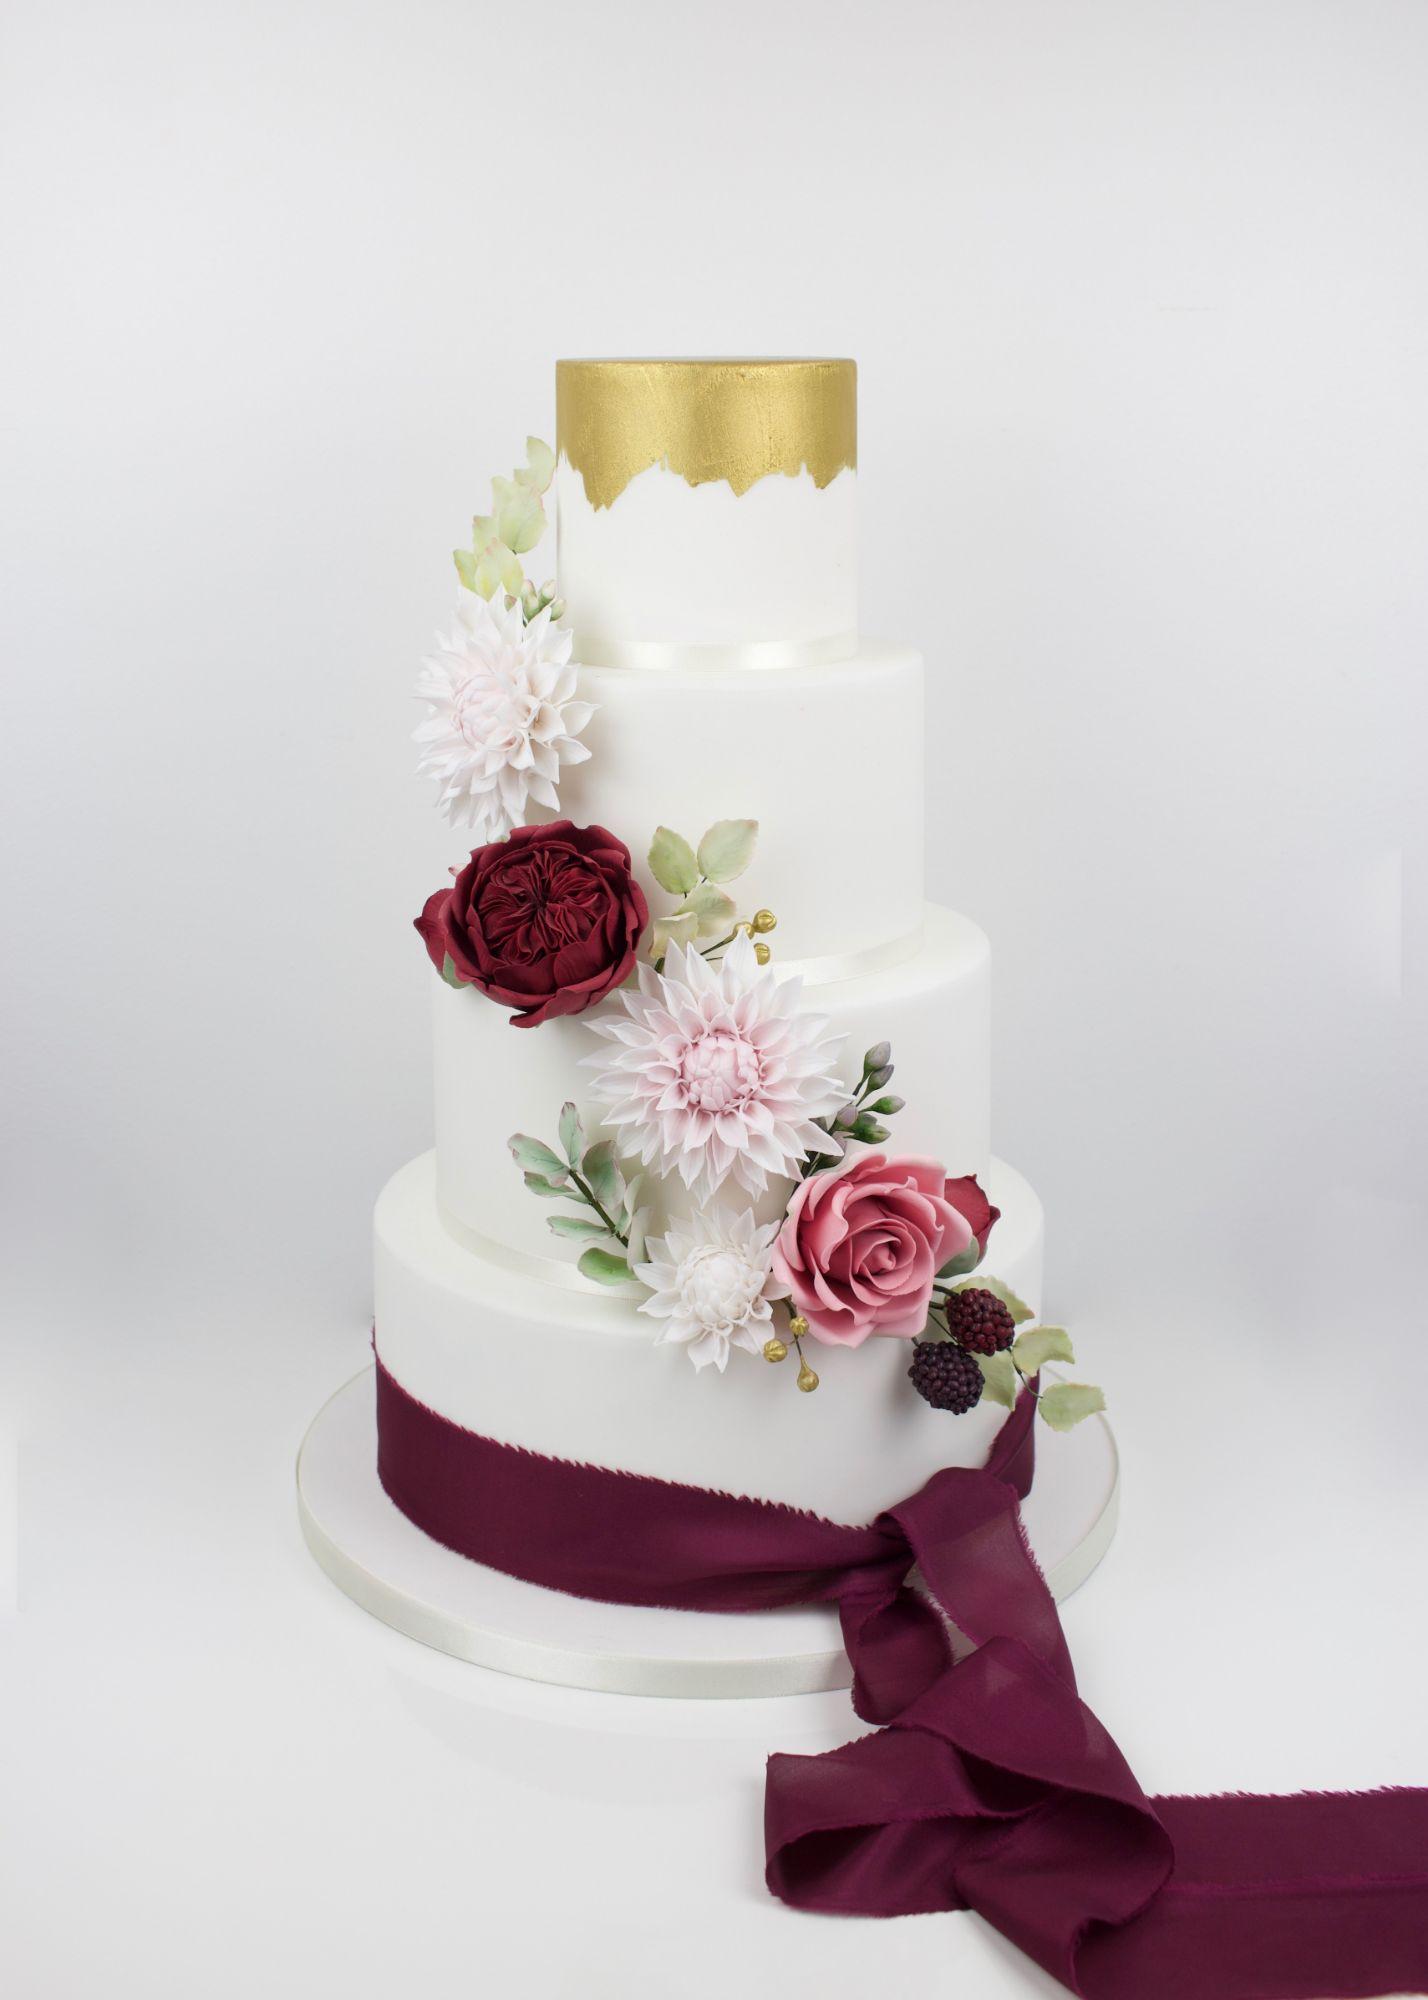 Handpainted gold wedding cake with casscadding sugar david austin roses, dalias and eucalyptus leaves.